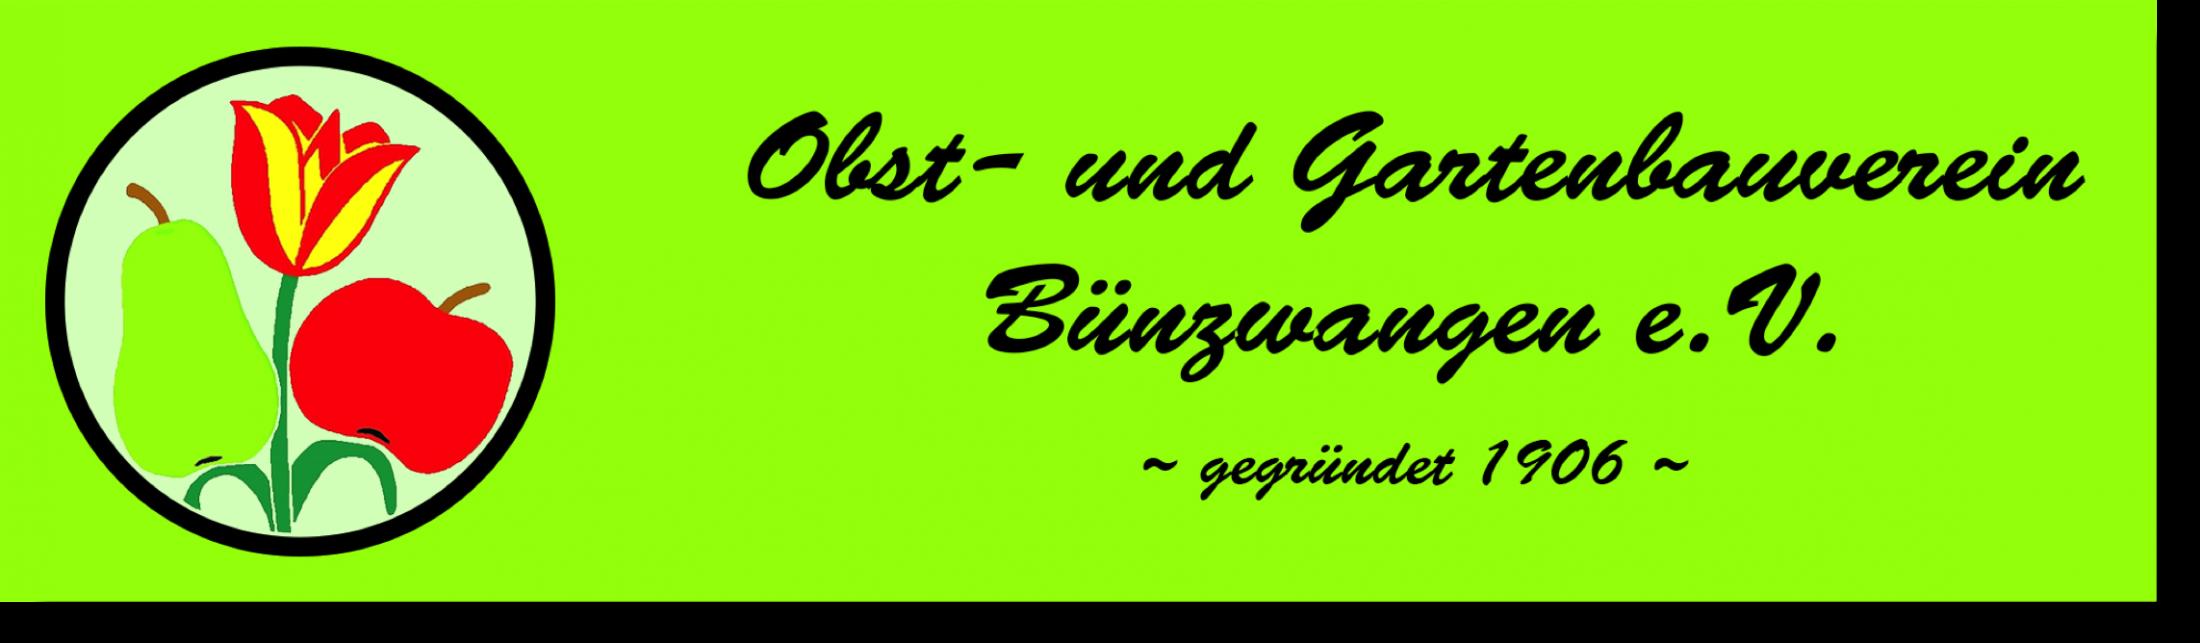 Logo OGV Bünzwangen e.V. mit Schattenwurf